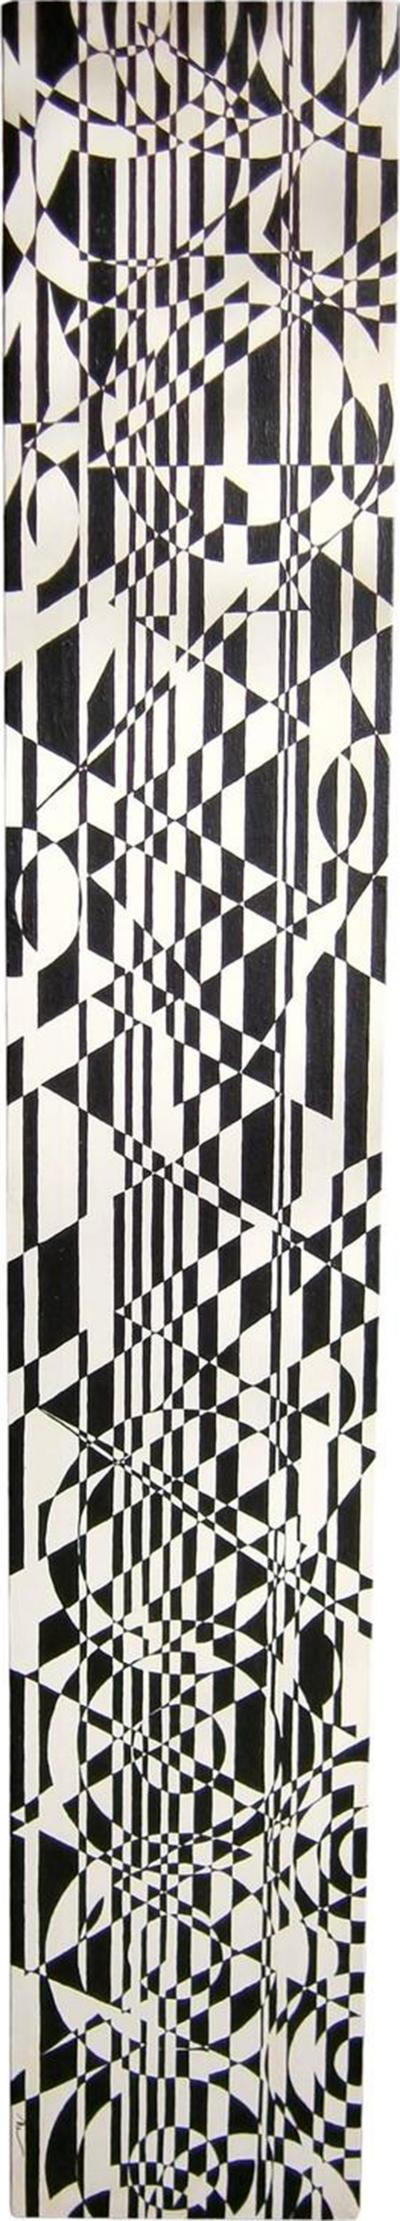 Mike Rottman Abstract Geometric by Mike Rottman